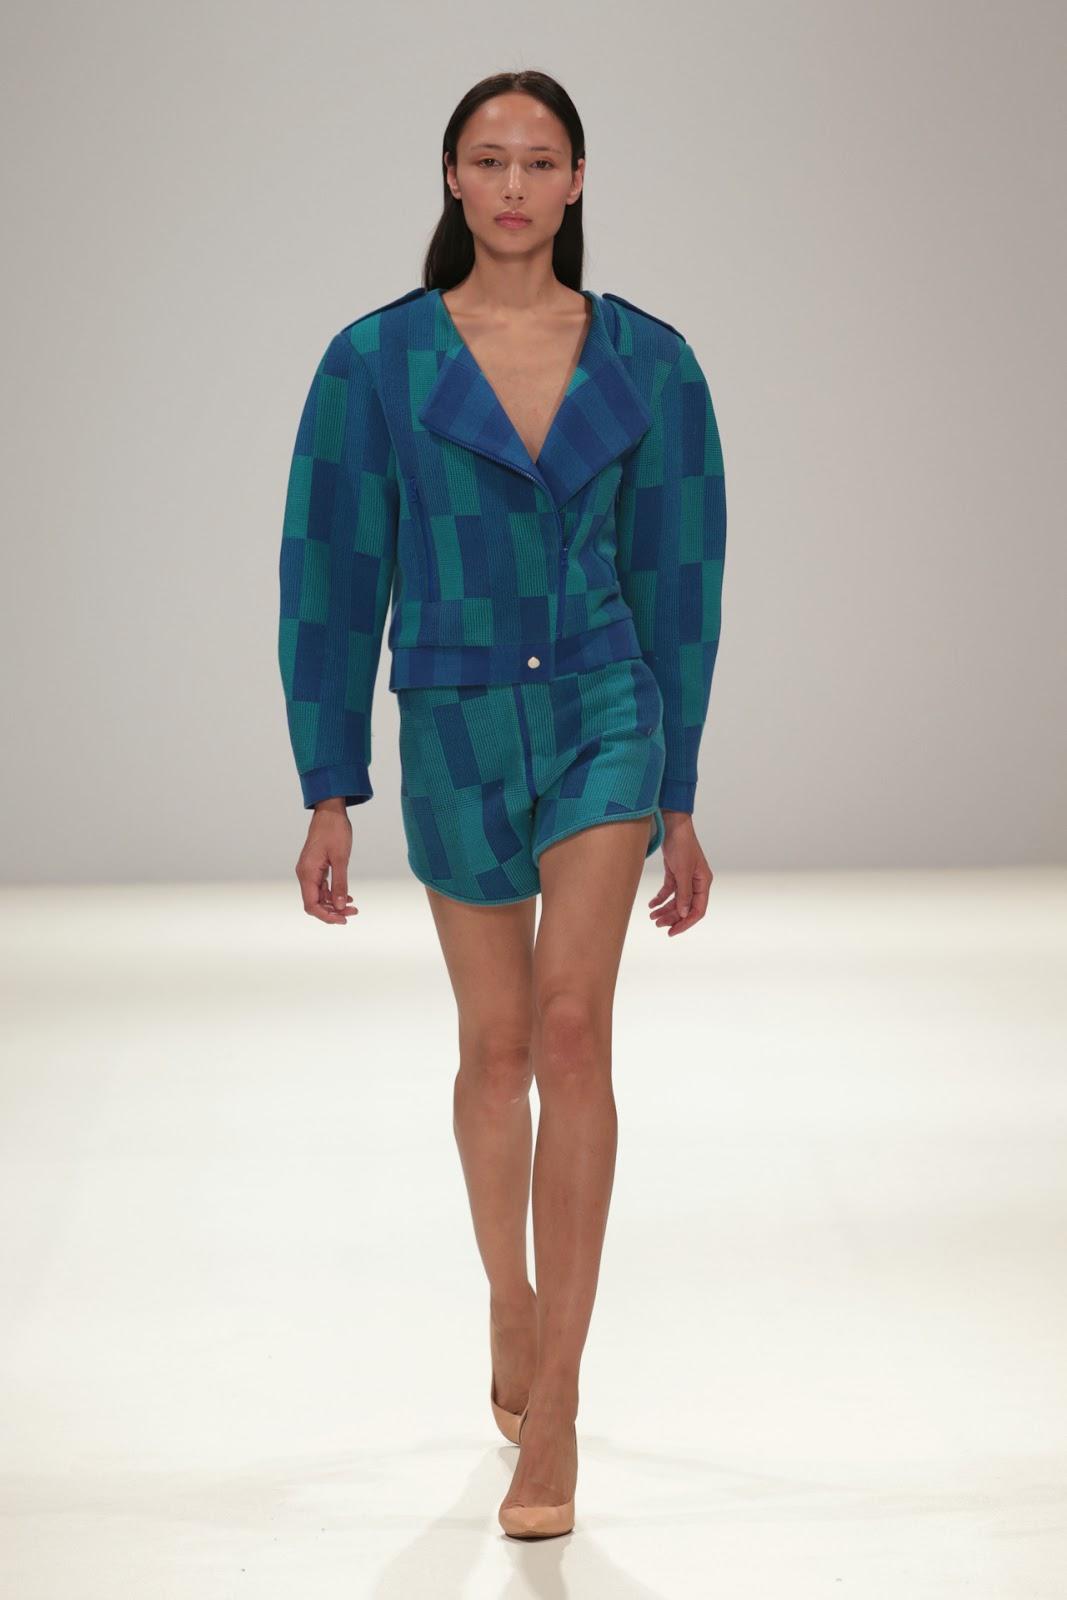 Swimwear Looks From London Fashion Week Spring 2013 Male Models Picture